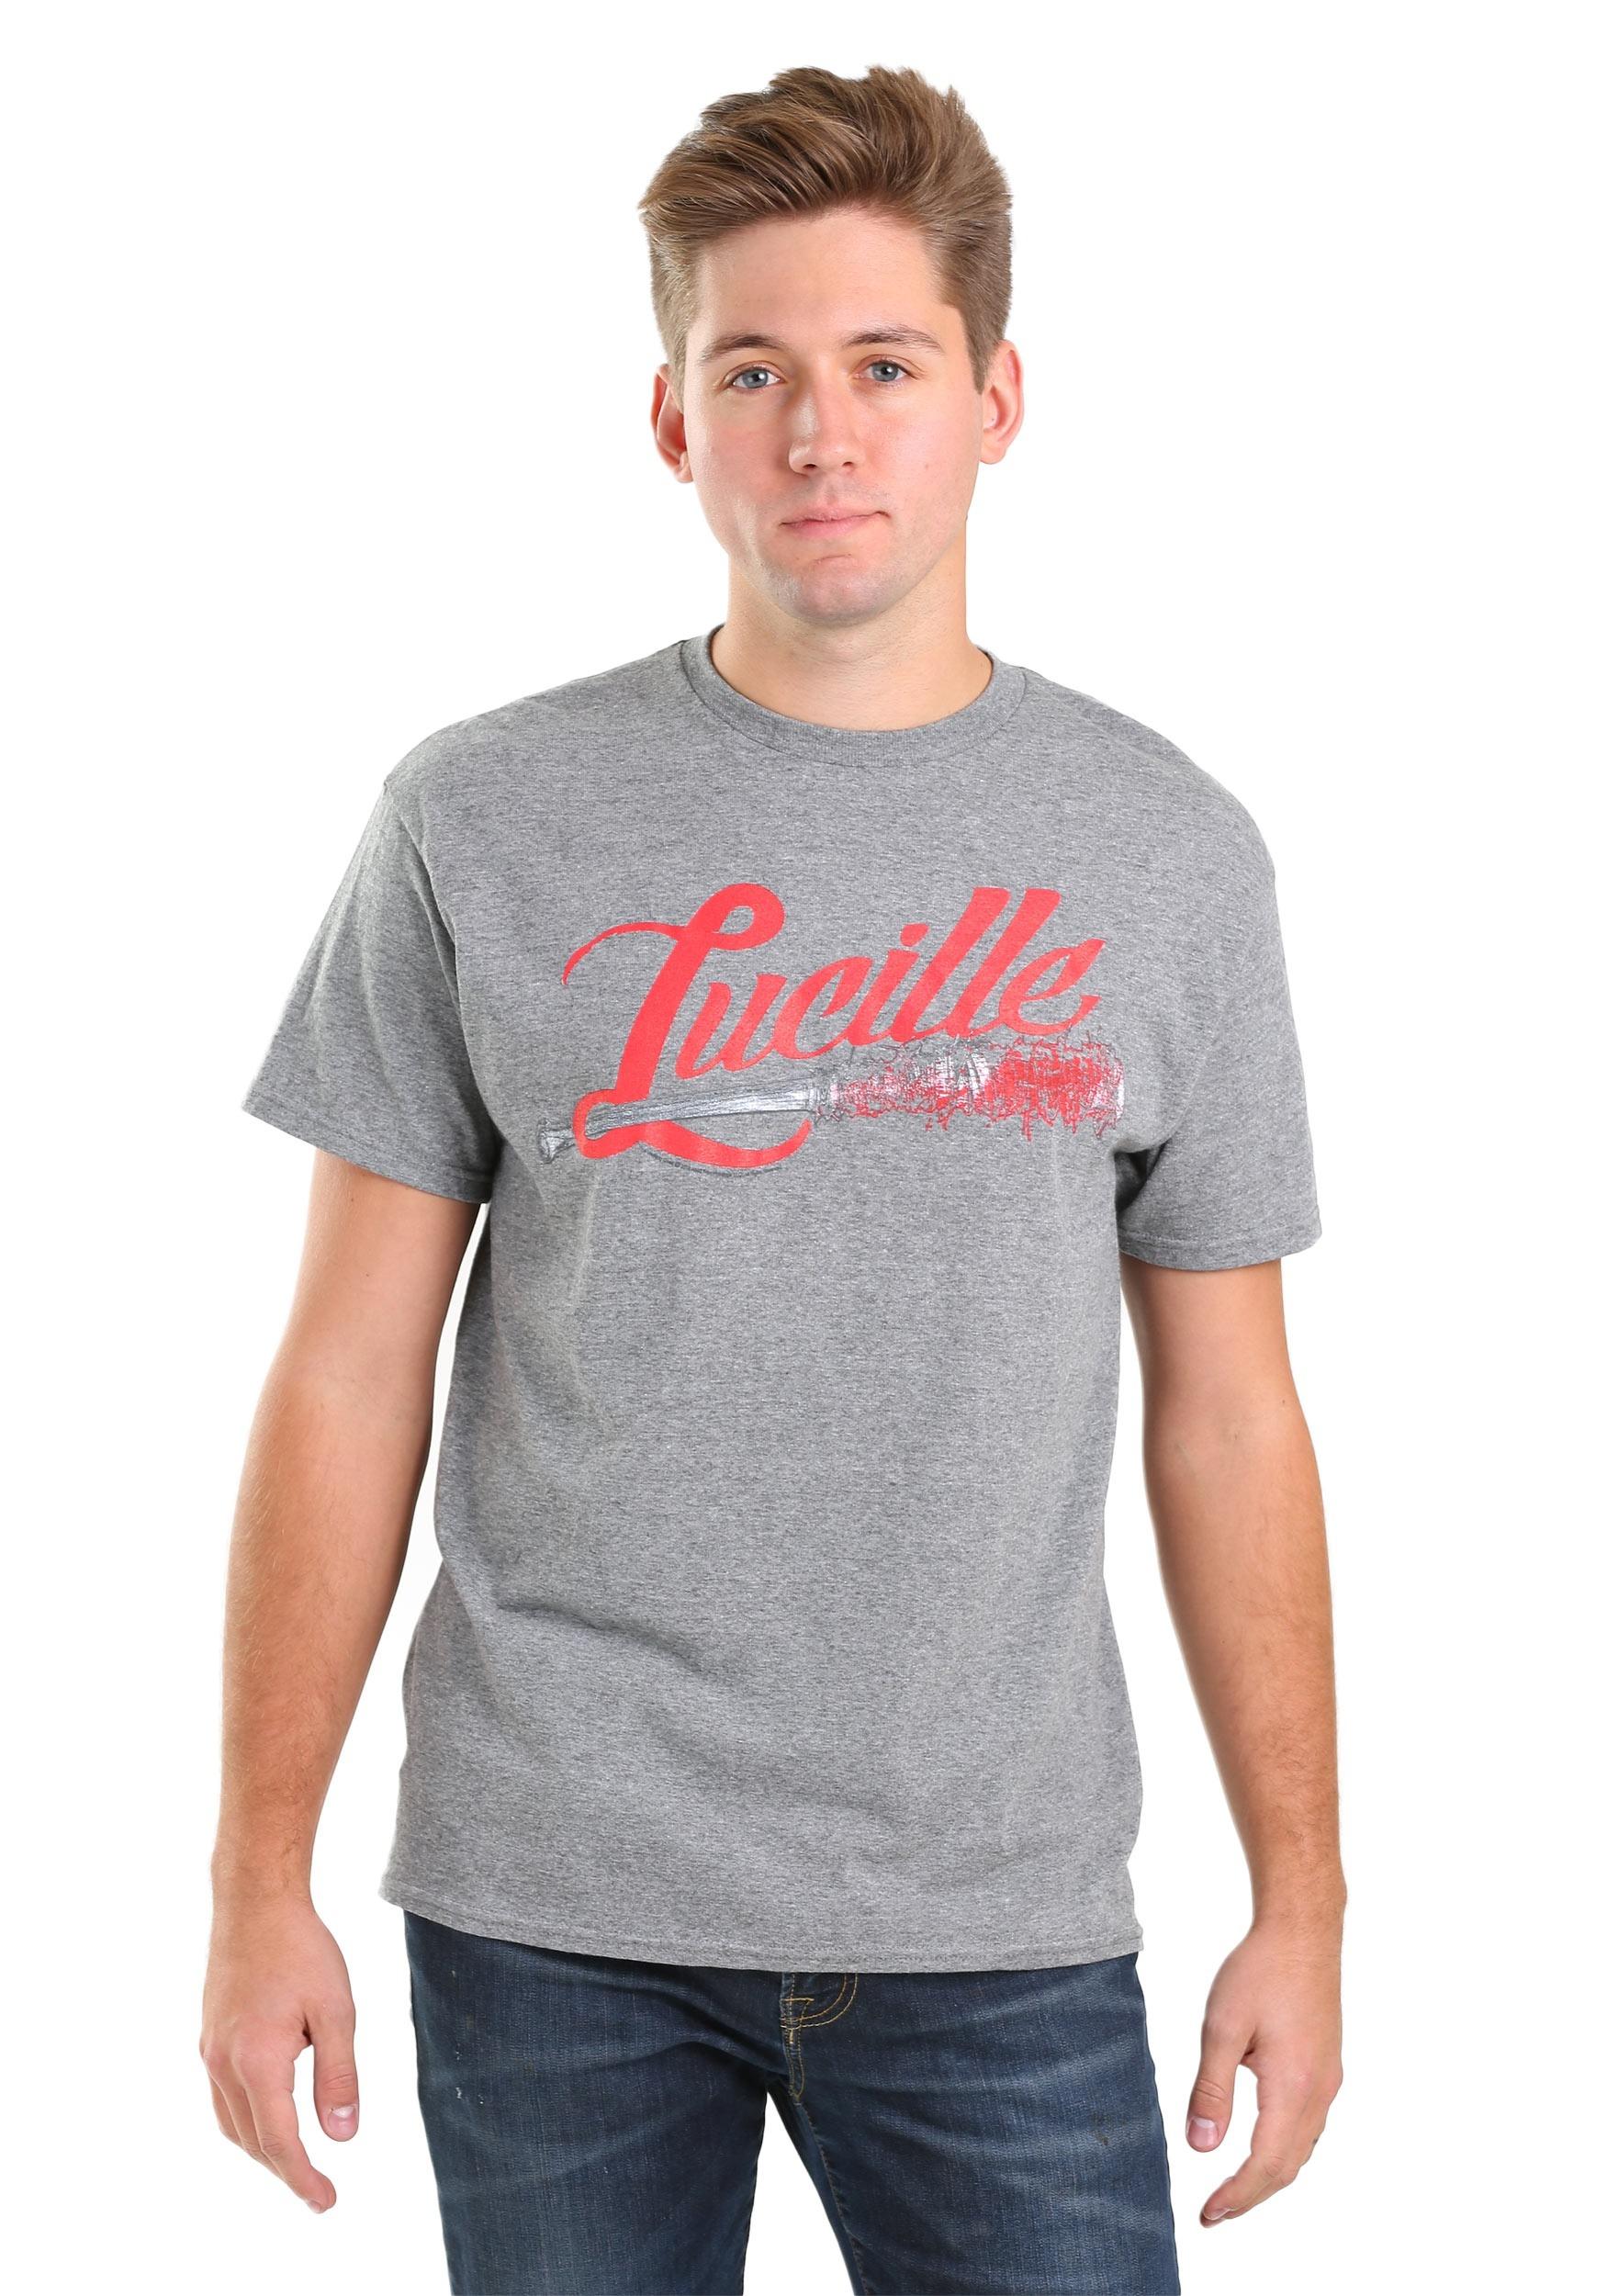 Lucille Baseball Bat T-Shirt for Men